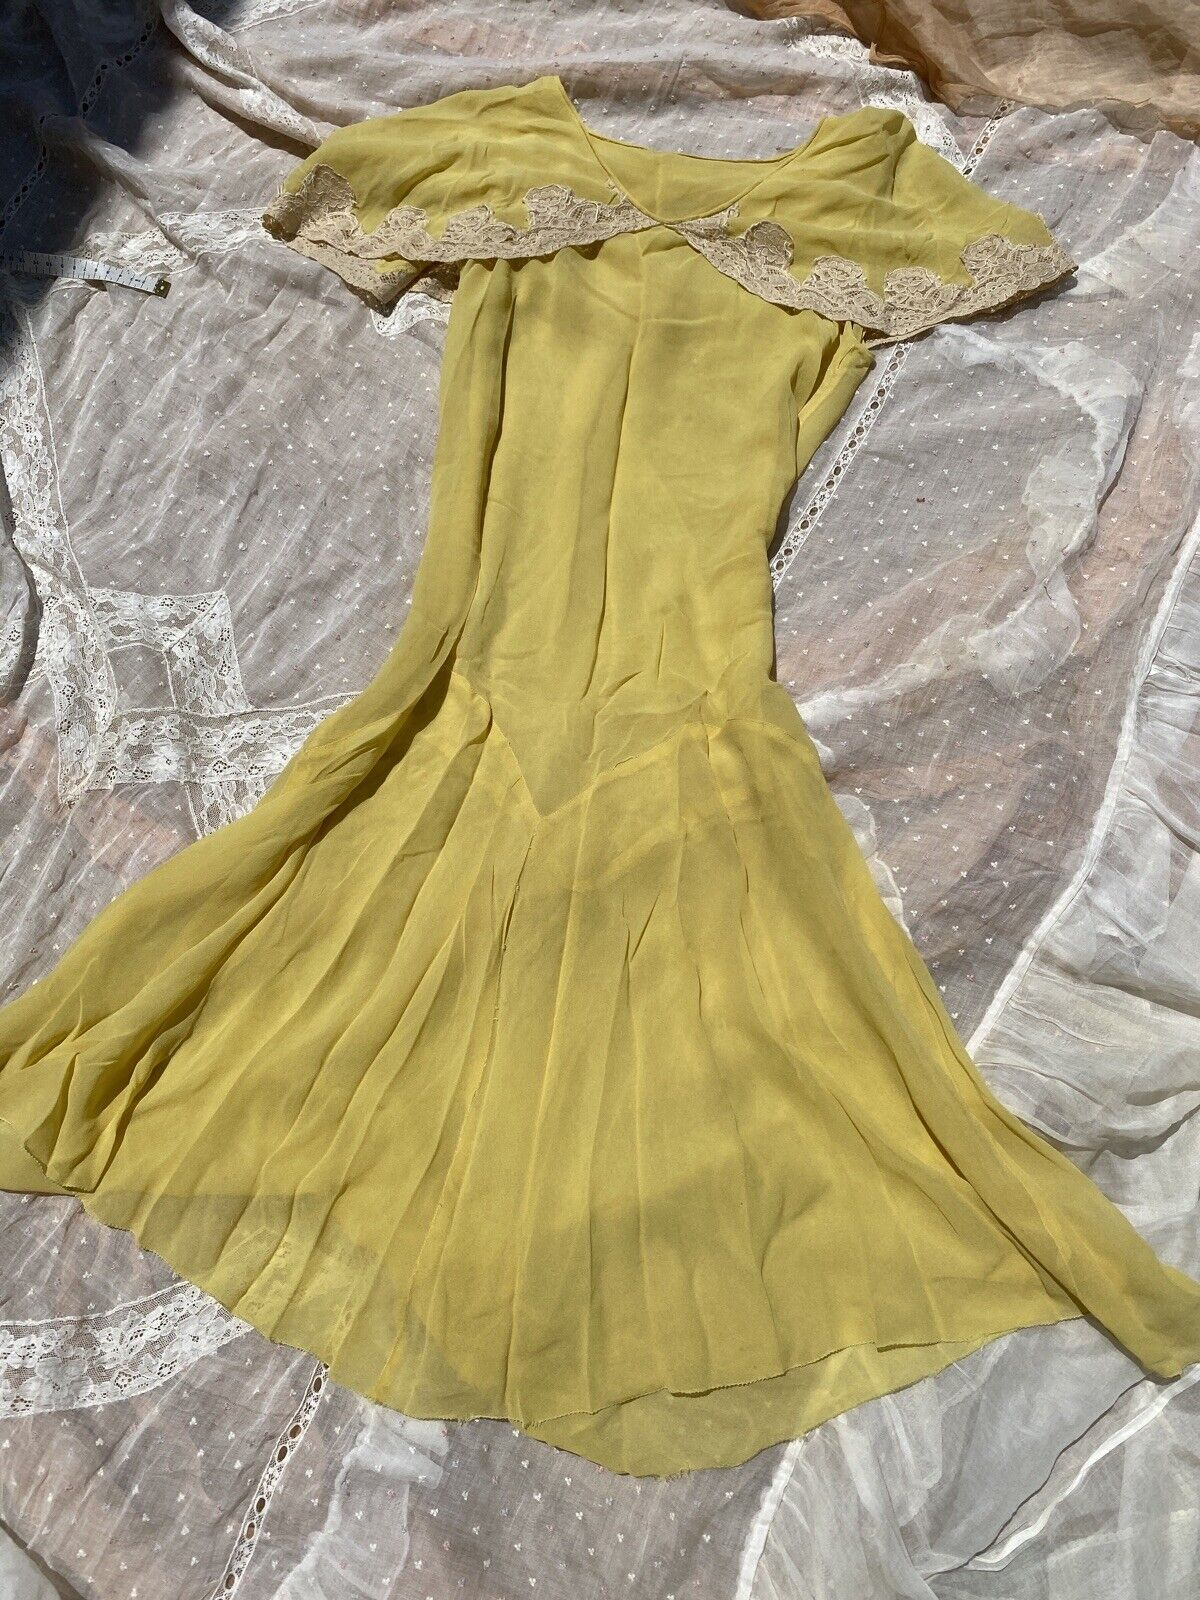 Antique 1920s 1930s Yellow Silk Chiffon Midi Dres… - image 2